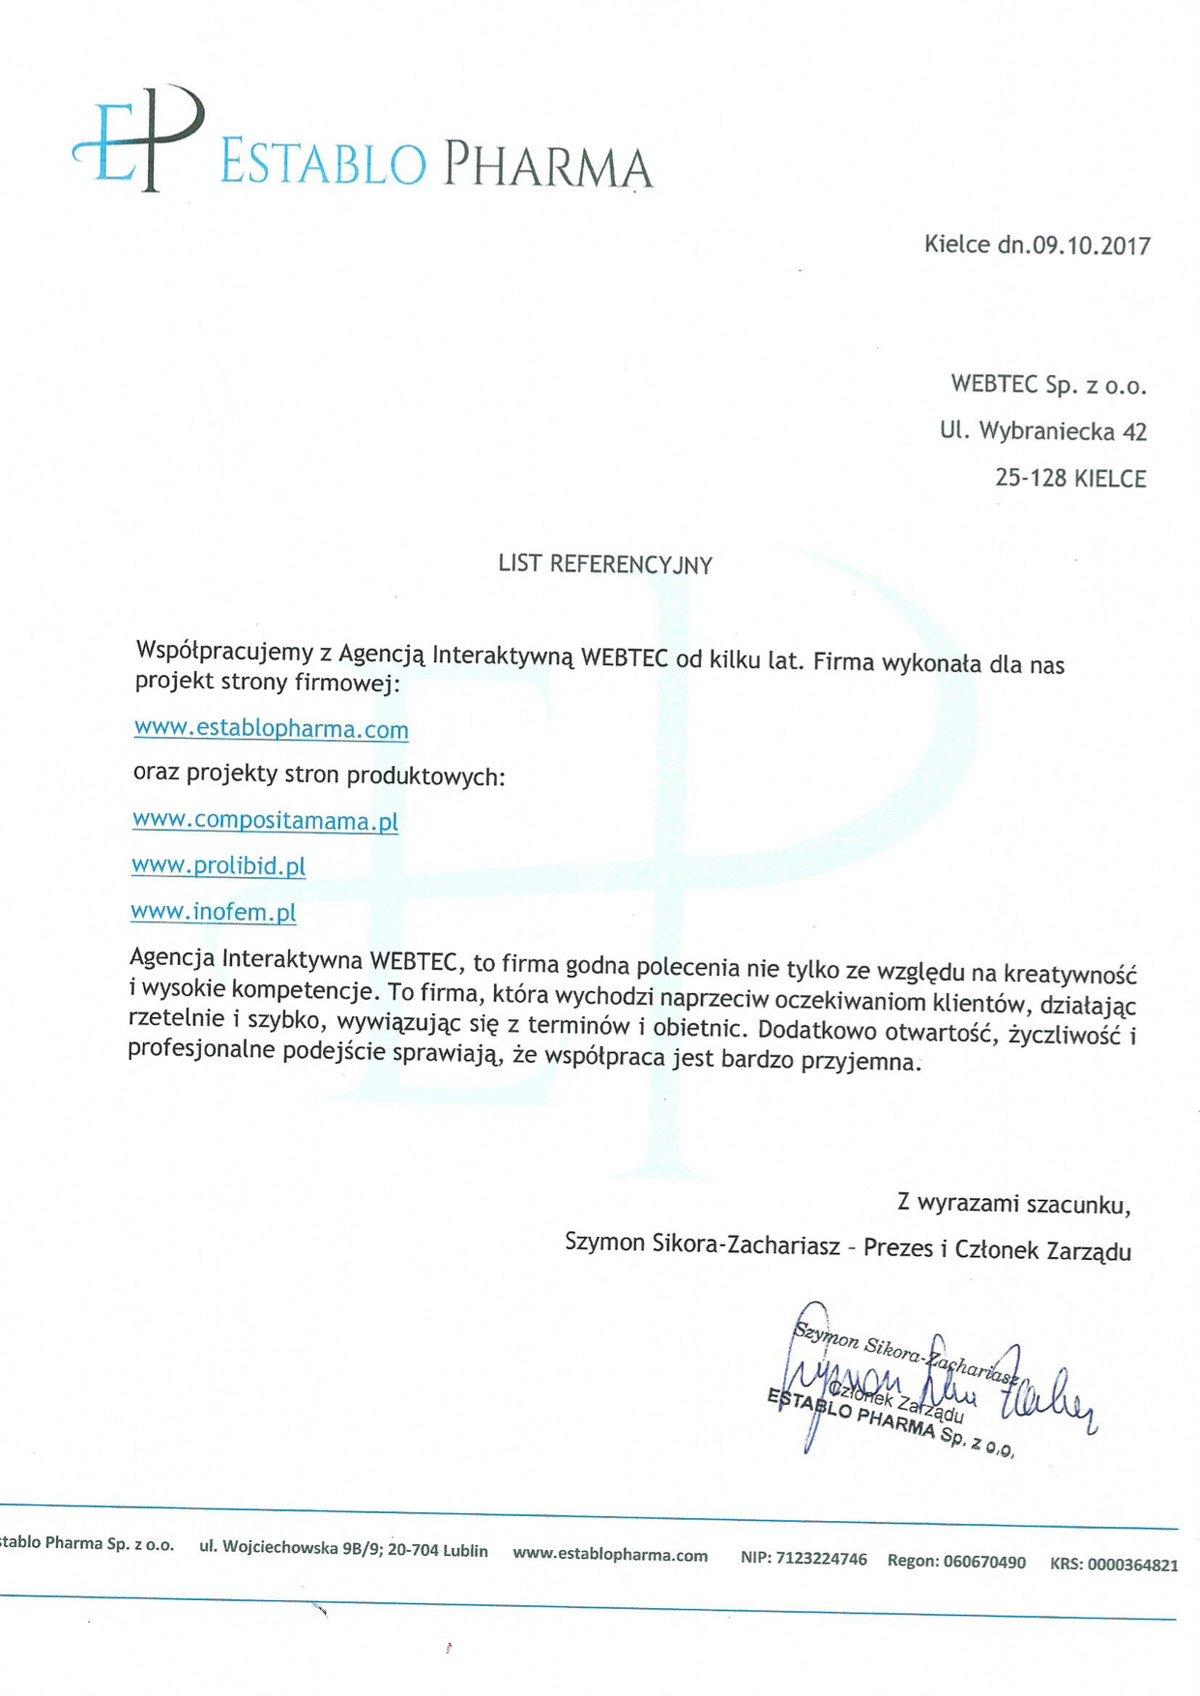 webtec referencje 1